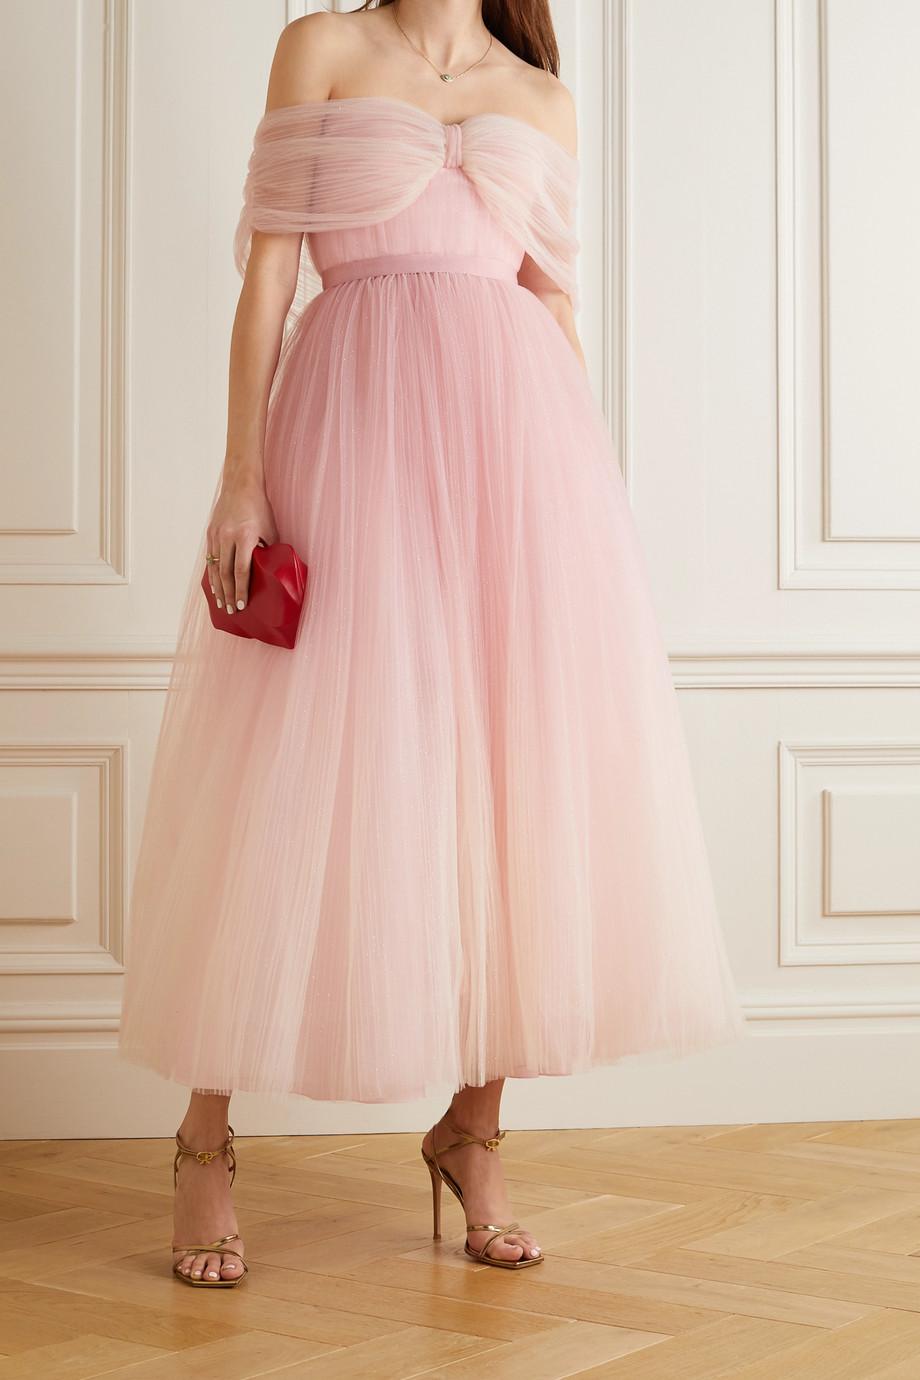 Jenny Packham Off-the-shoulder ombré glittered tulle midi dress